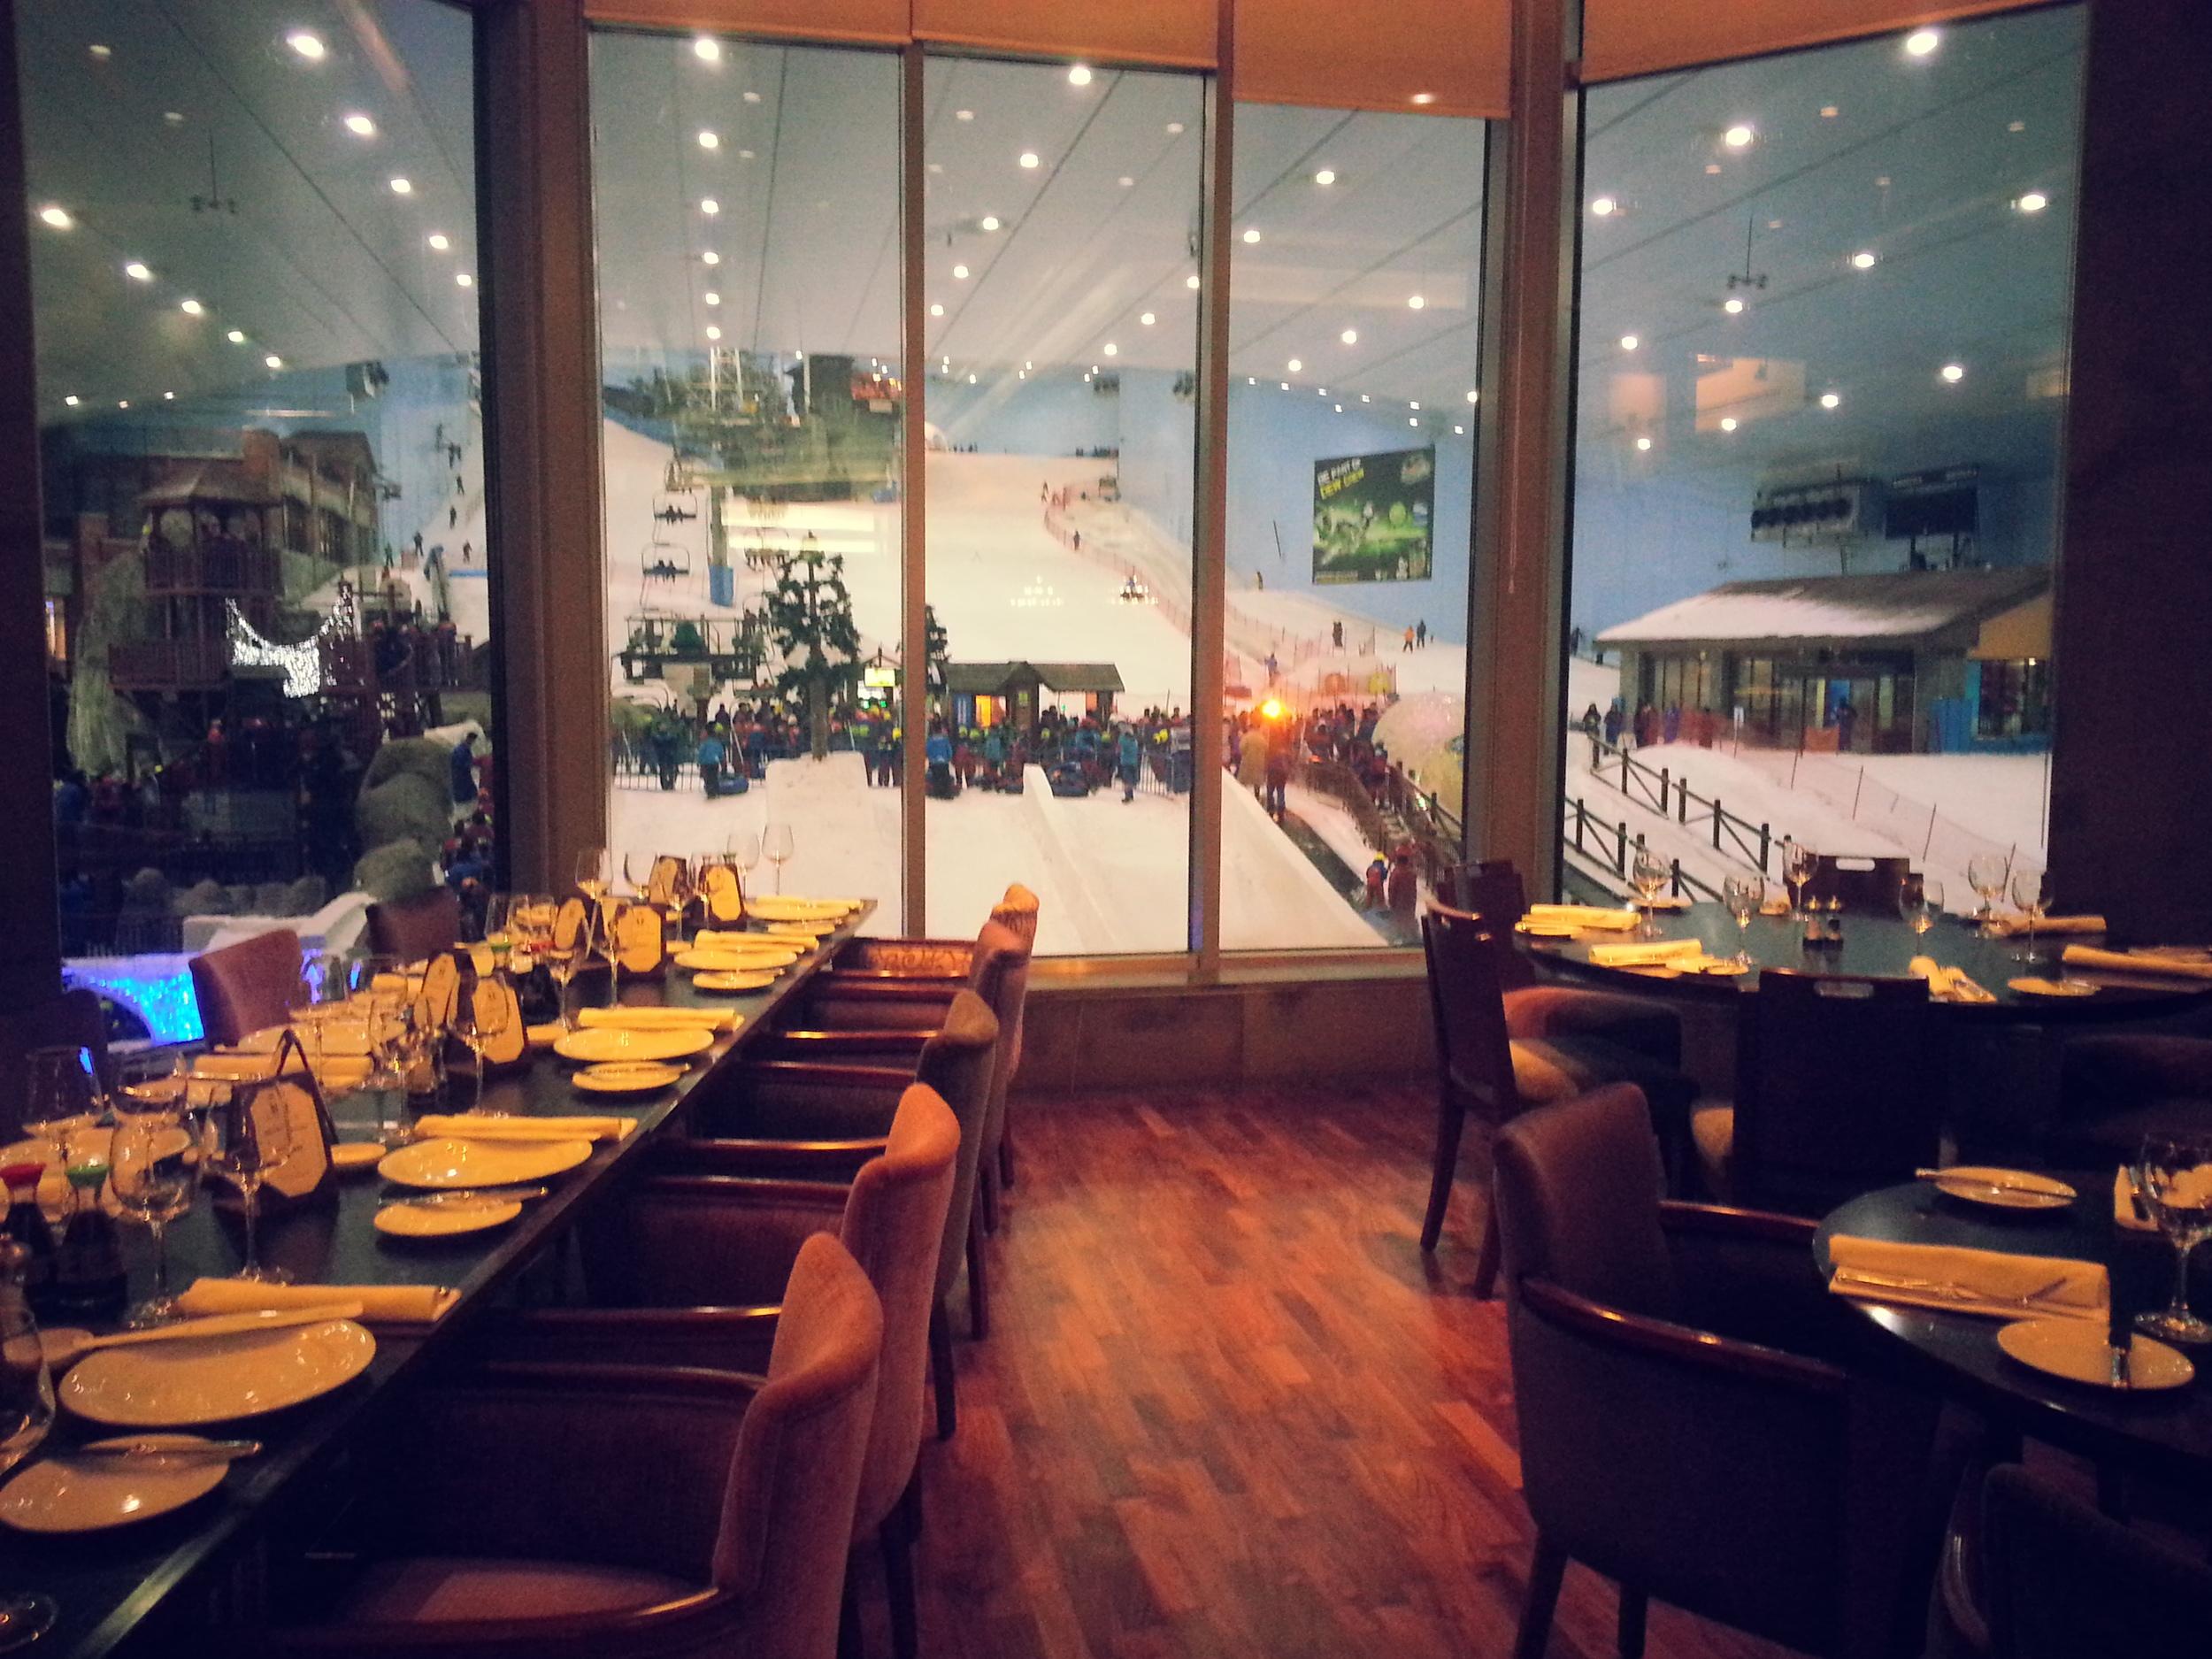 Salmontini Restaurant at the Mall of Emirates in Dubai - the unique venue for Sushi Networking.